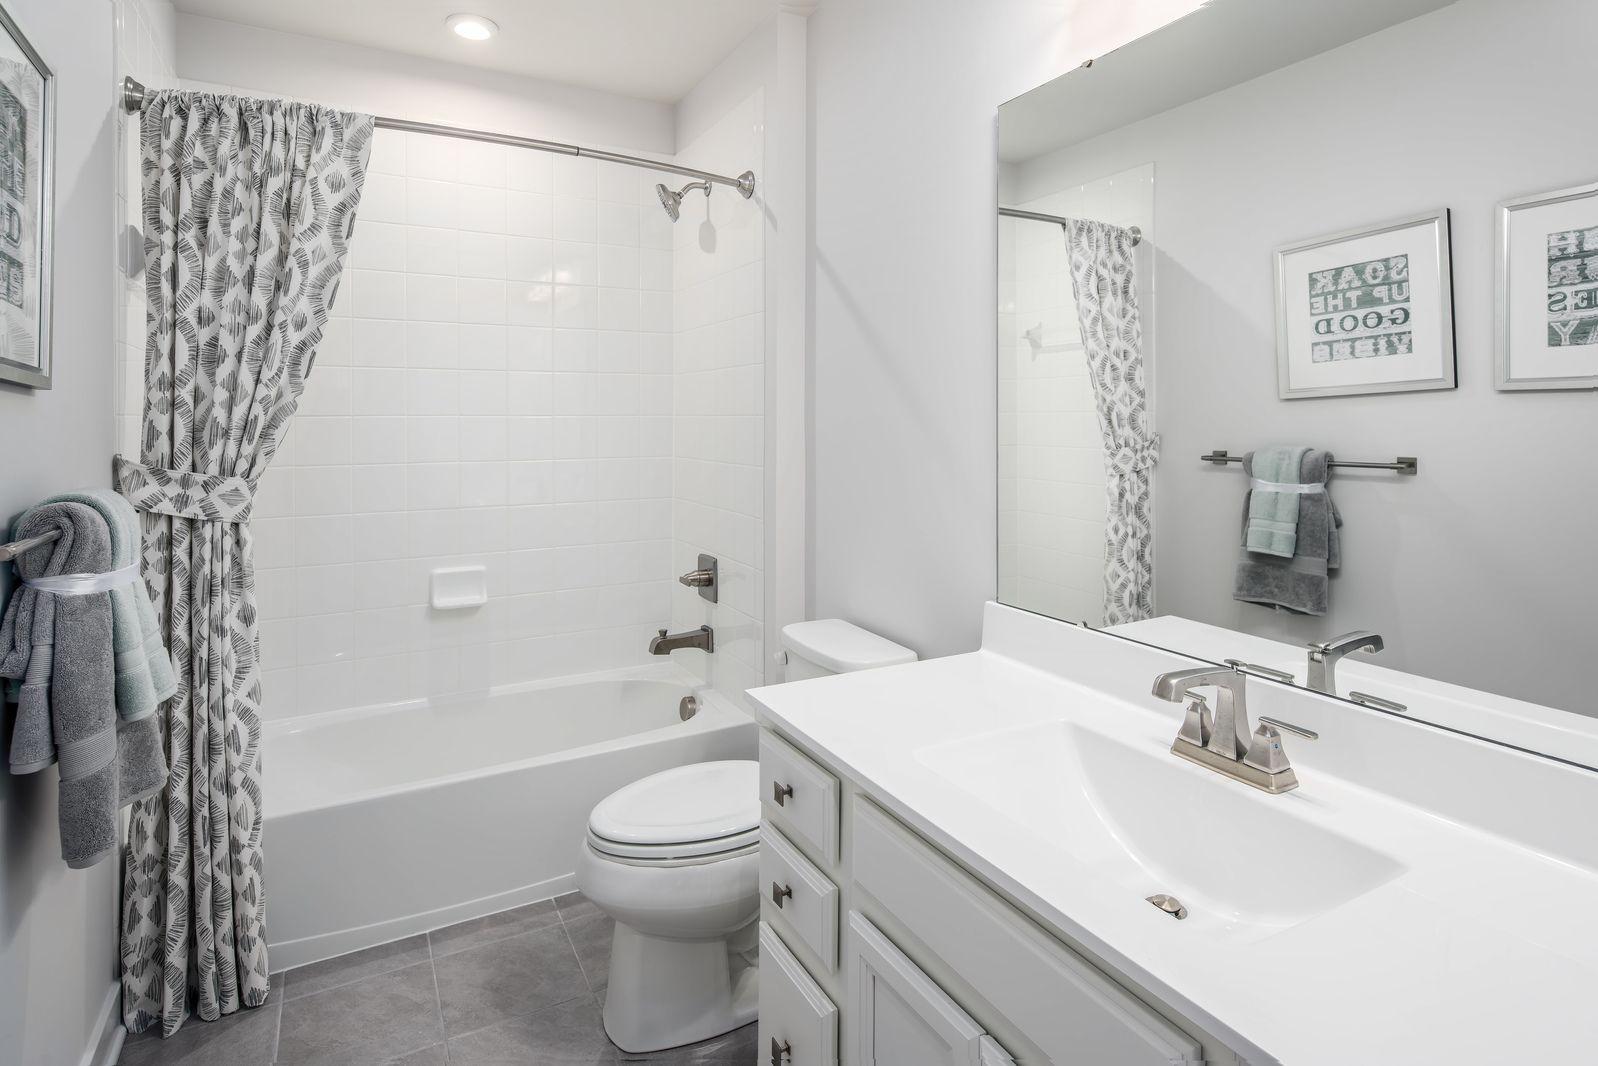 Bathroom featured in the Ballenger By Ryan Homes in Dover, DE